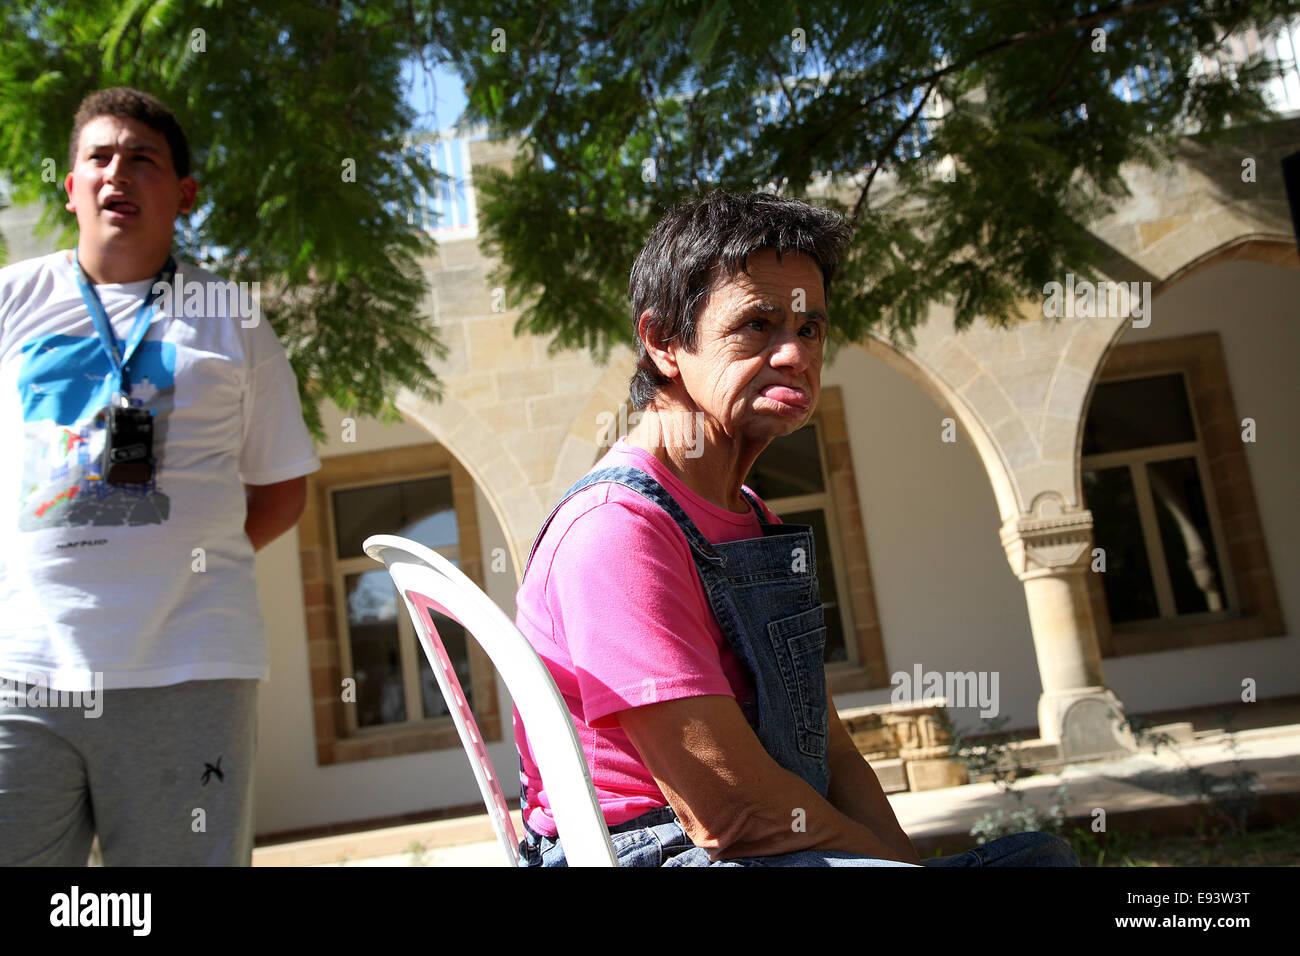 Cyprus. 18th Oct, 2014. Kid with disabilites sitting in the yard of Presidential for Radiomarathonios. Radiomarathonios - Stock Image